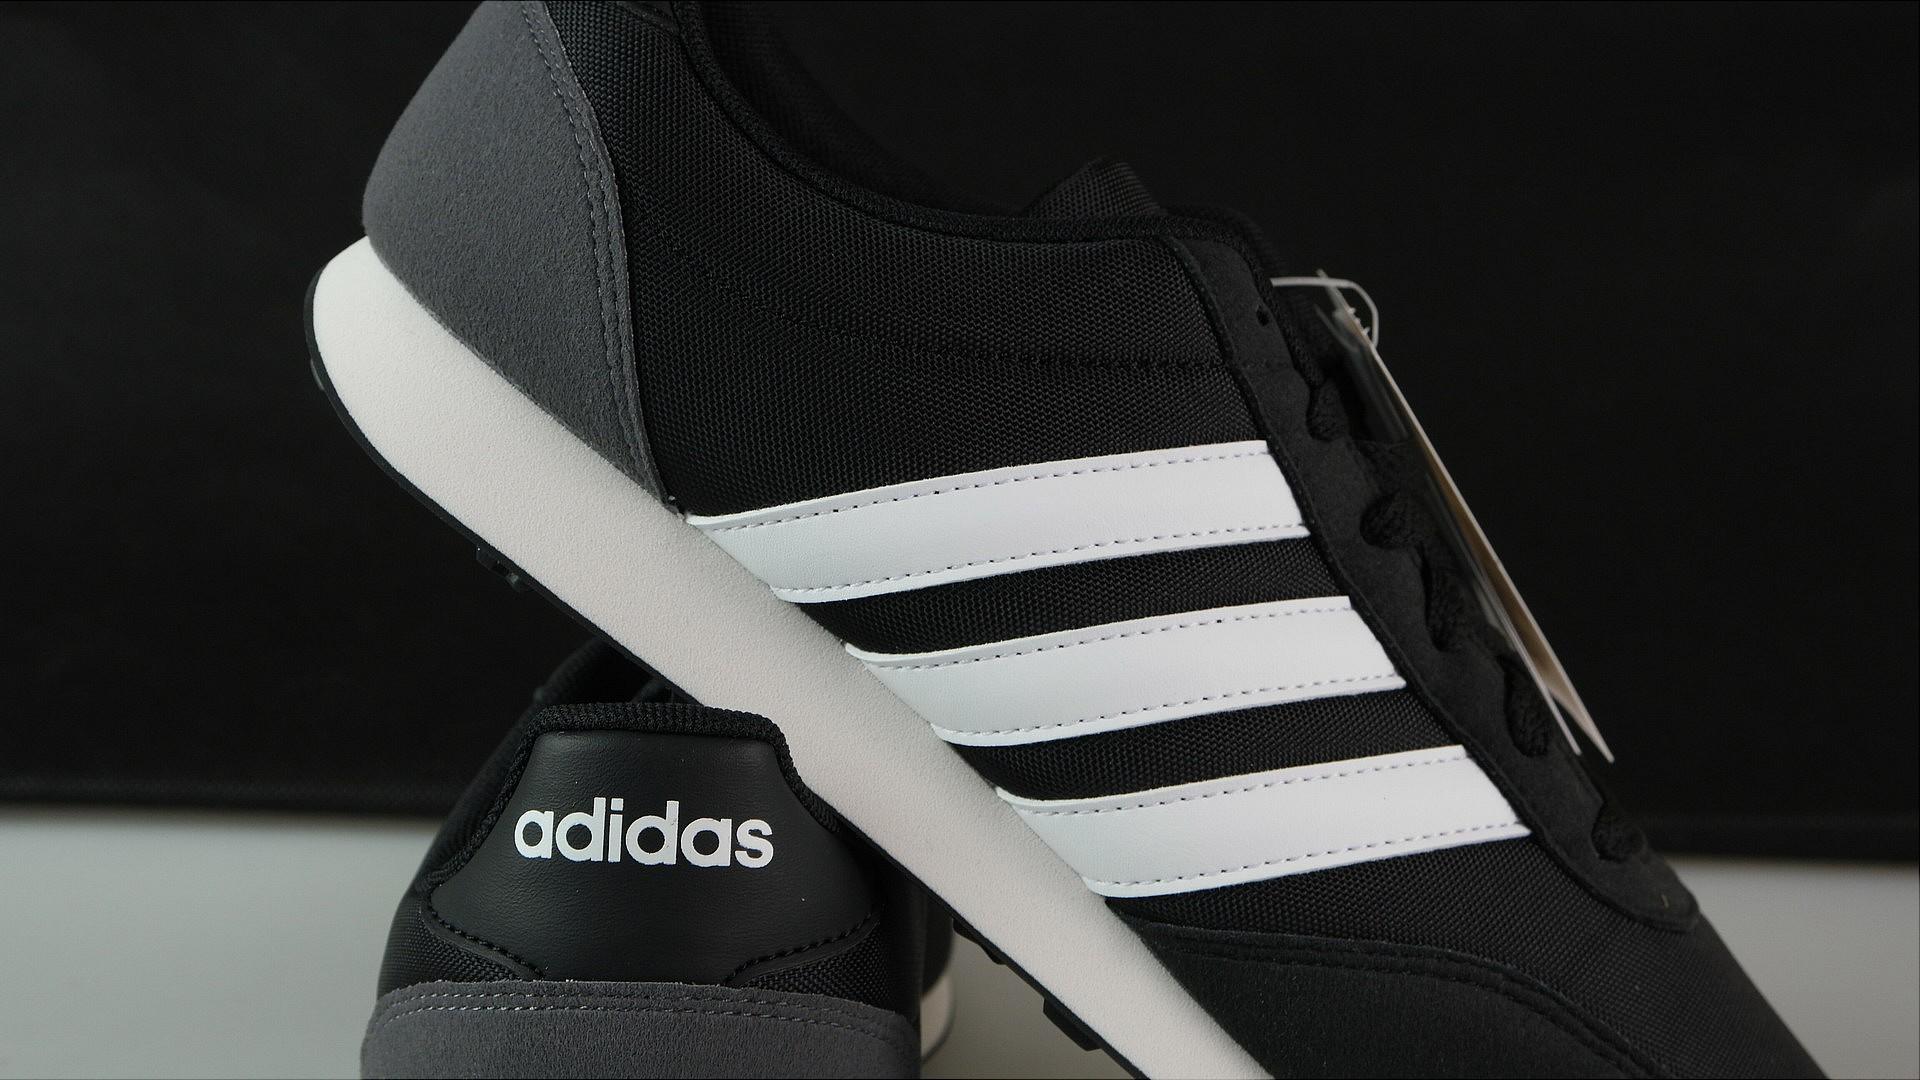 adidas V RACER 2.0 BC0106 rozmiar 43,3 7211353488